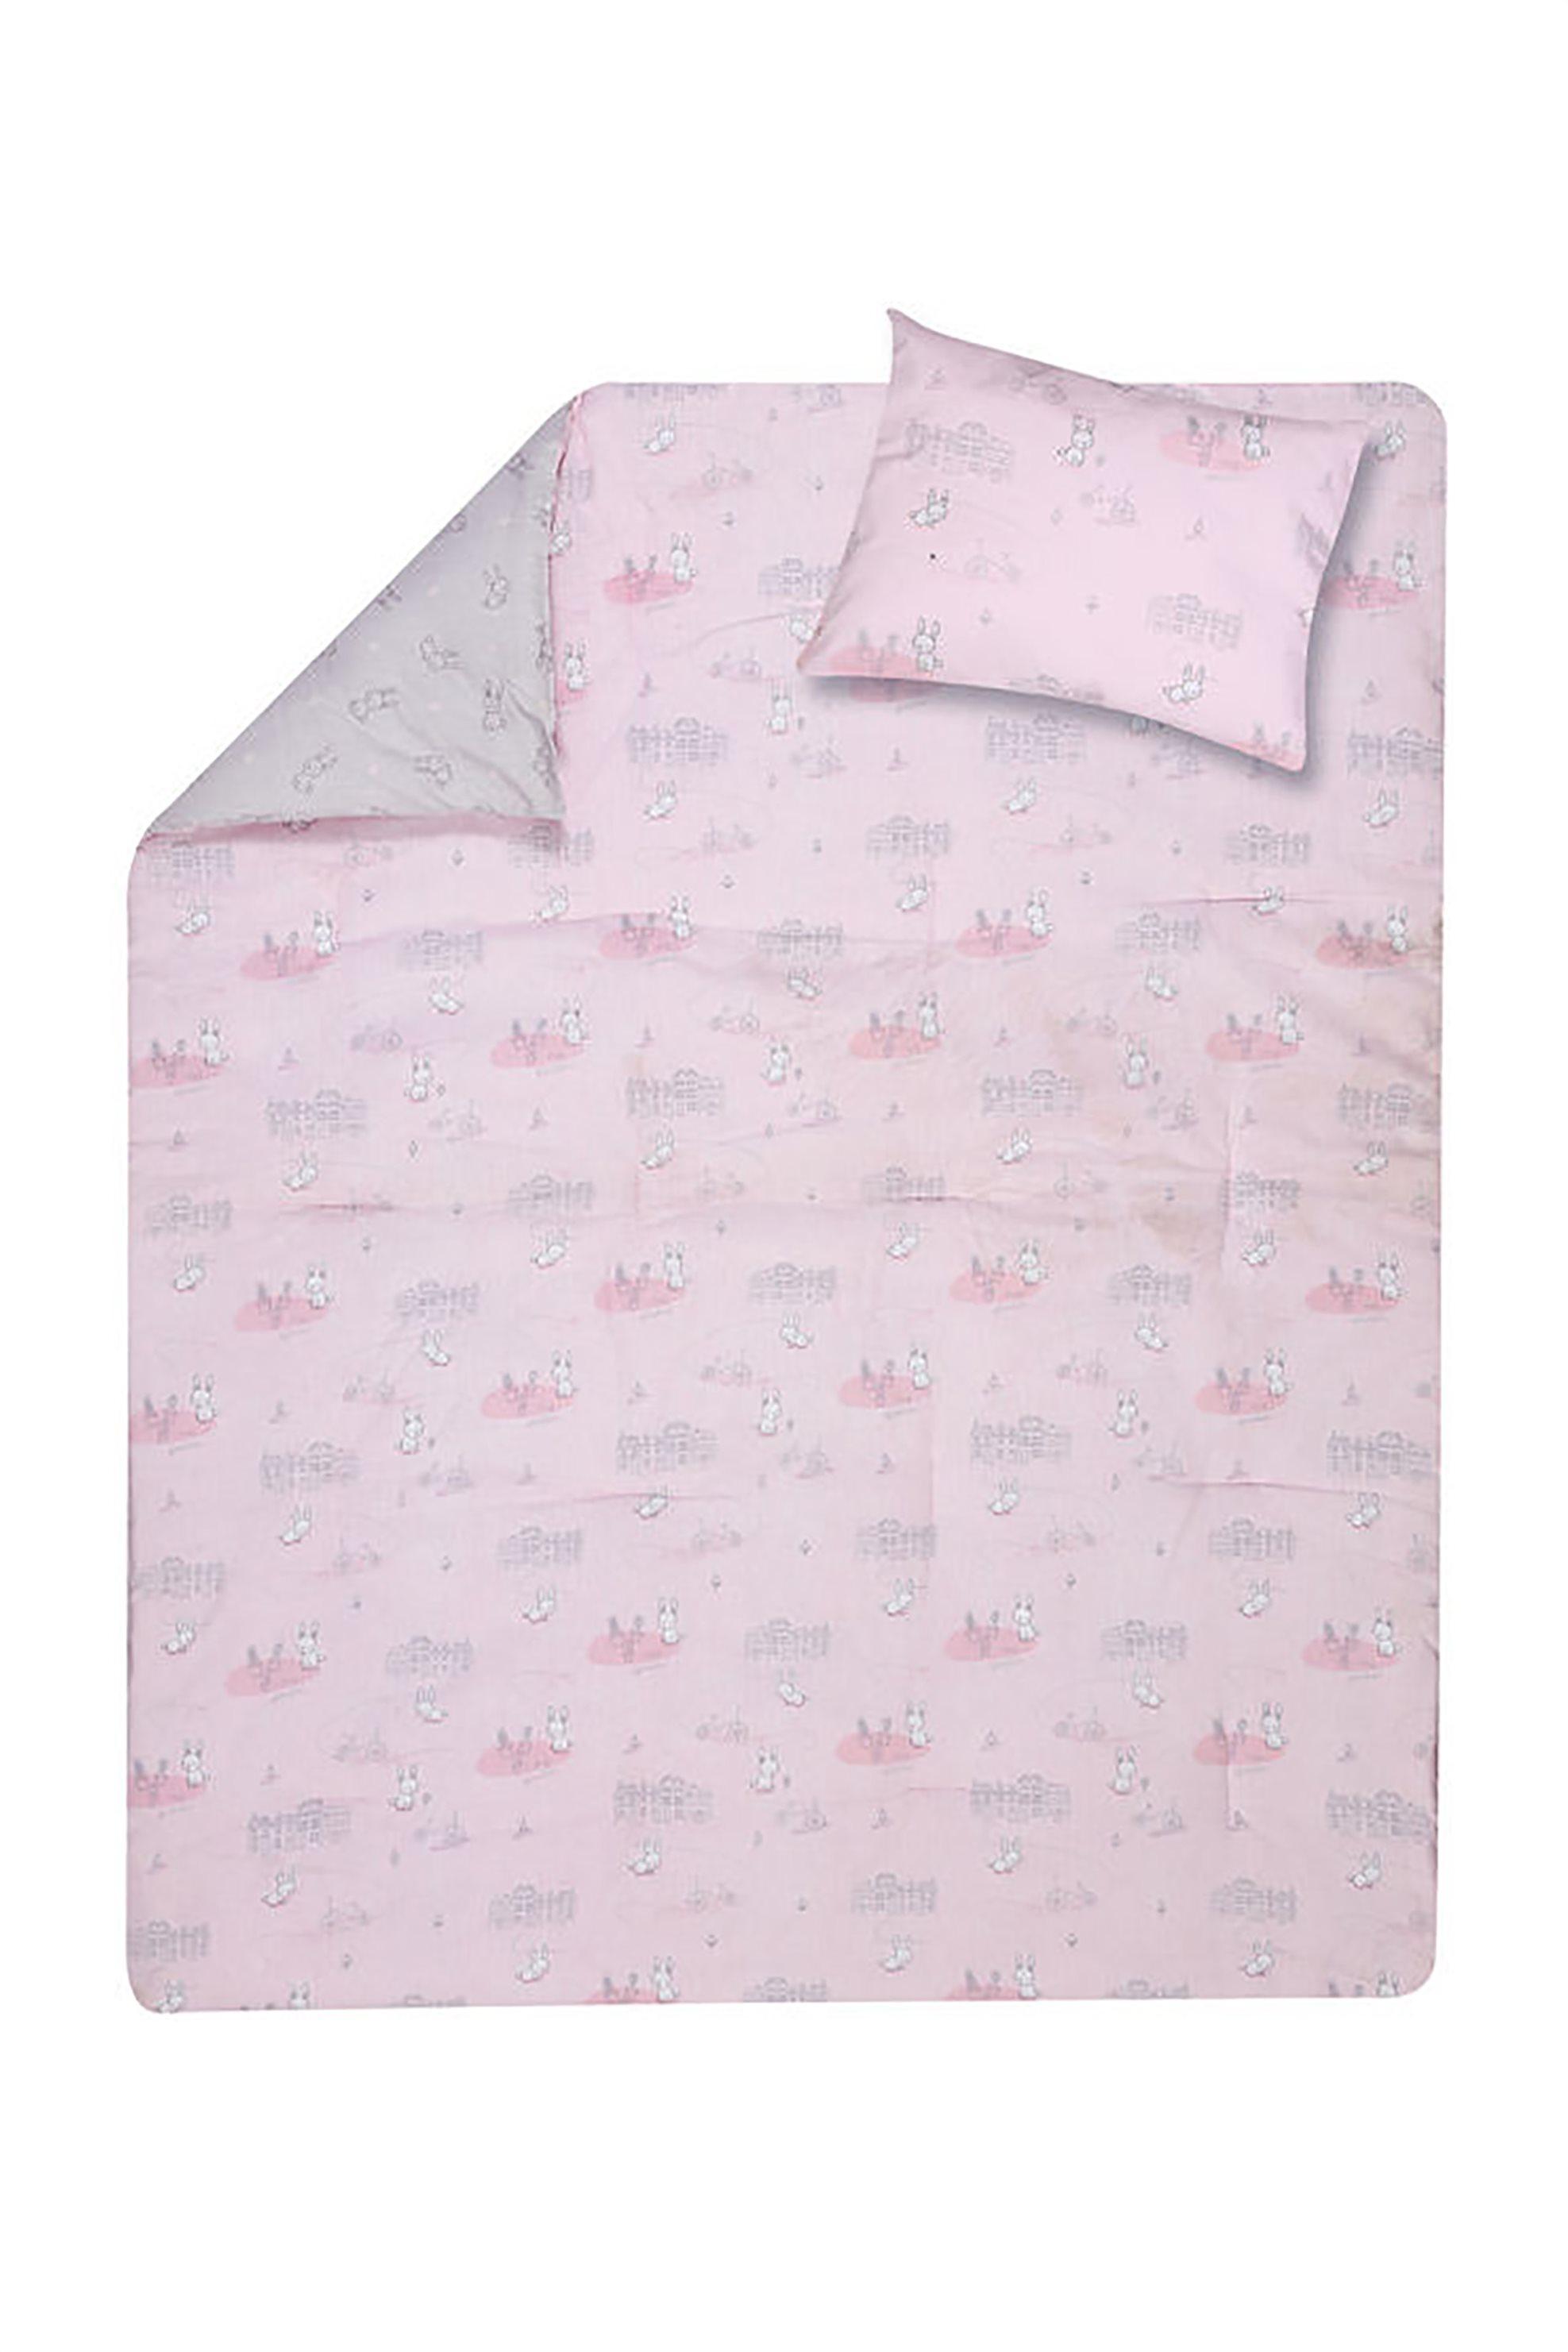 NEF-NEF Σετ βρεφική παπλωματοθήκη ροζ Bunny Life (2 τεμάχια) - 022220 - Ροζ home   παιδια   παπλωματοθήκες   σετ παιδικές παπλωματοθήκες